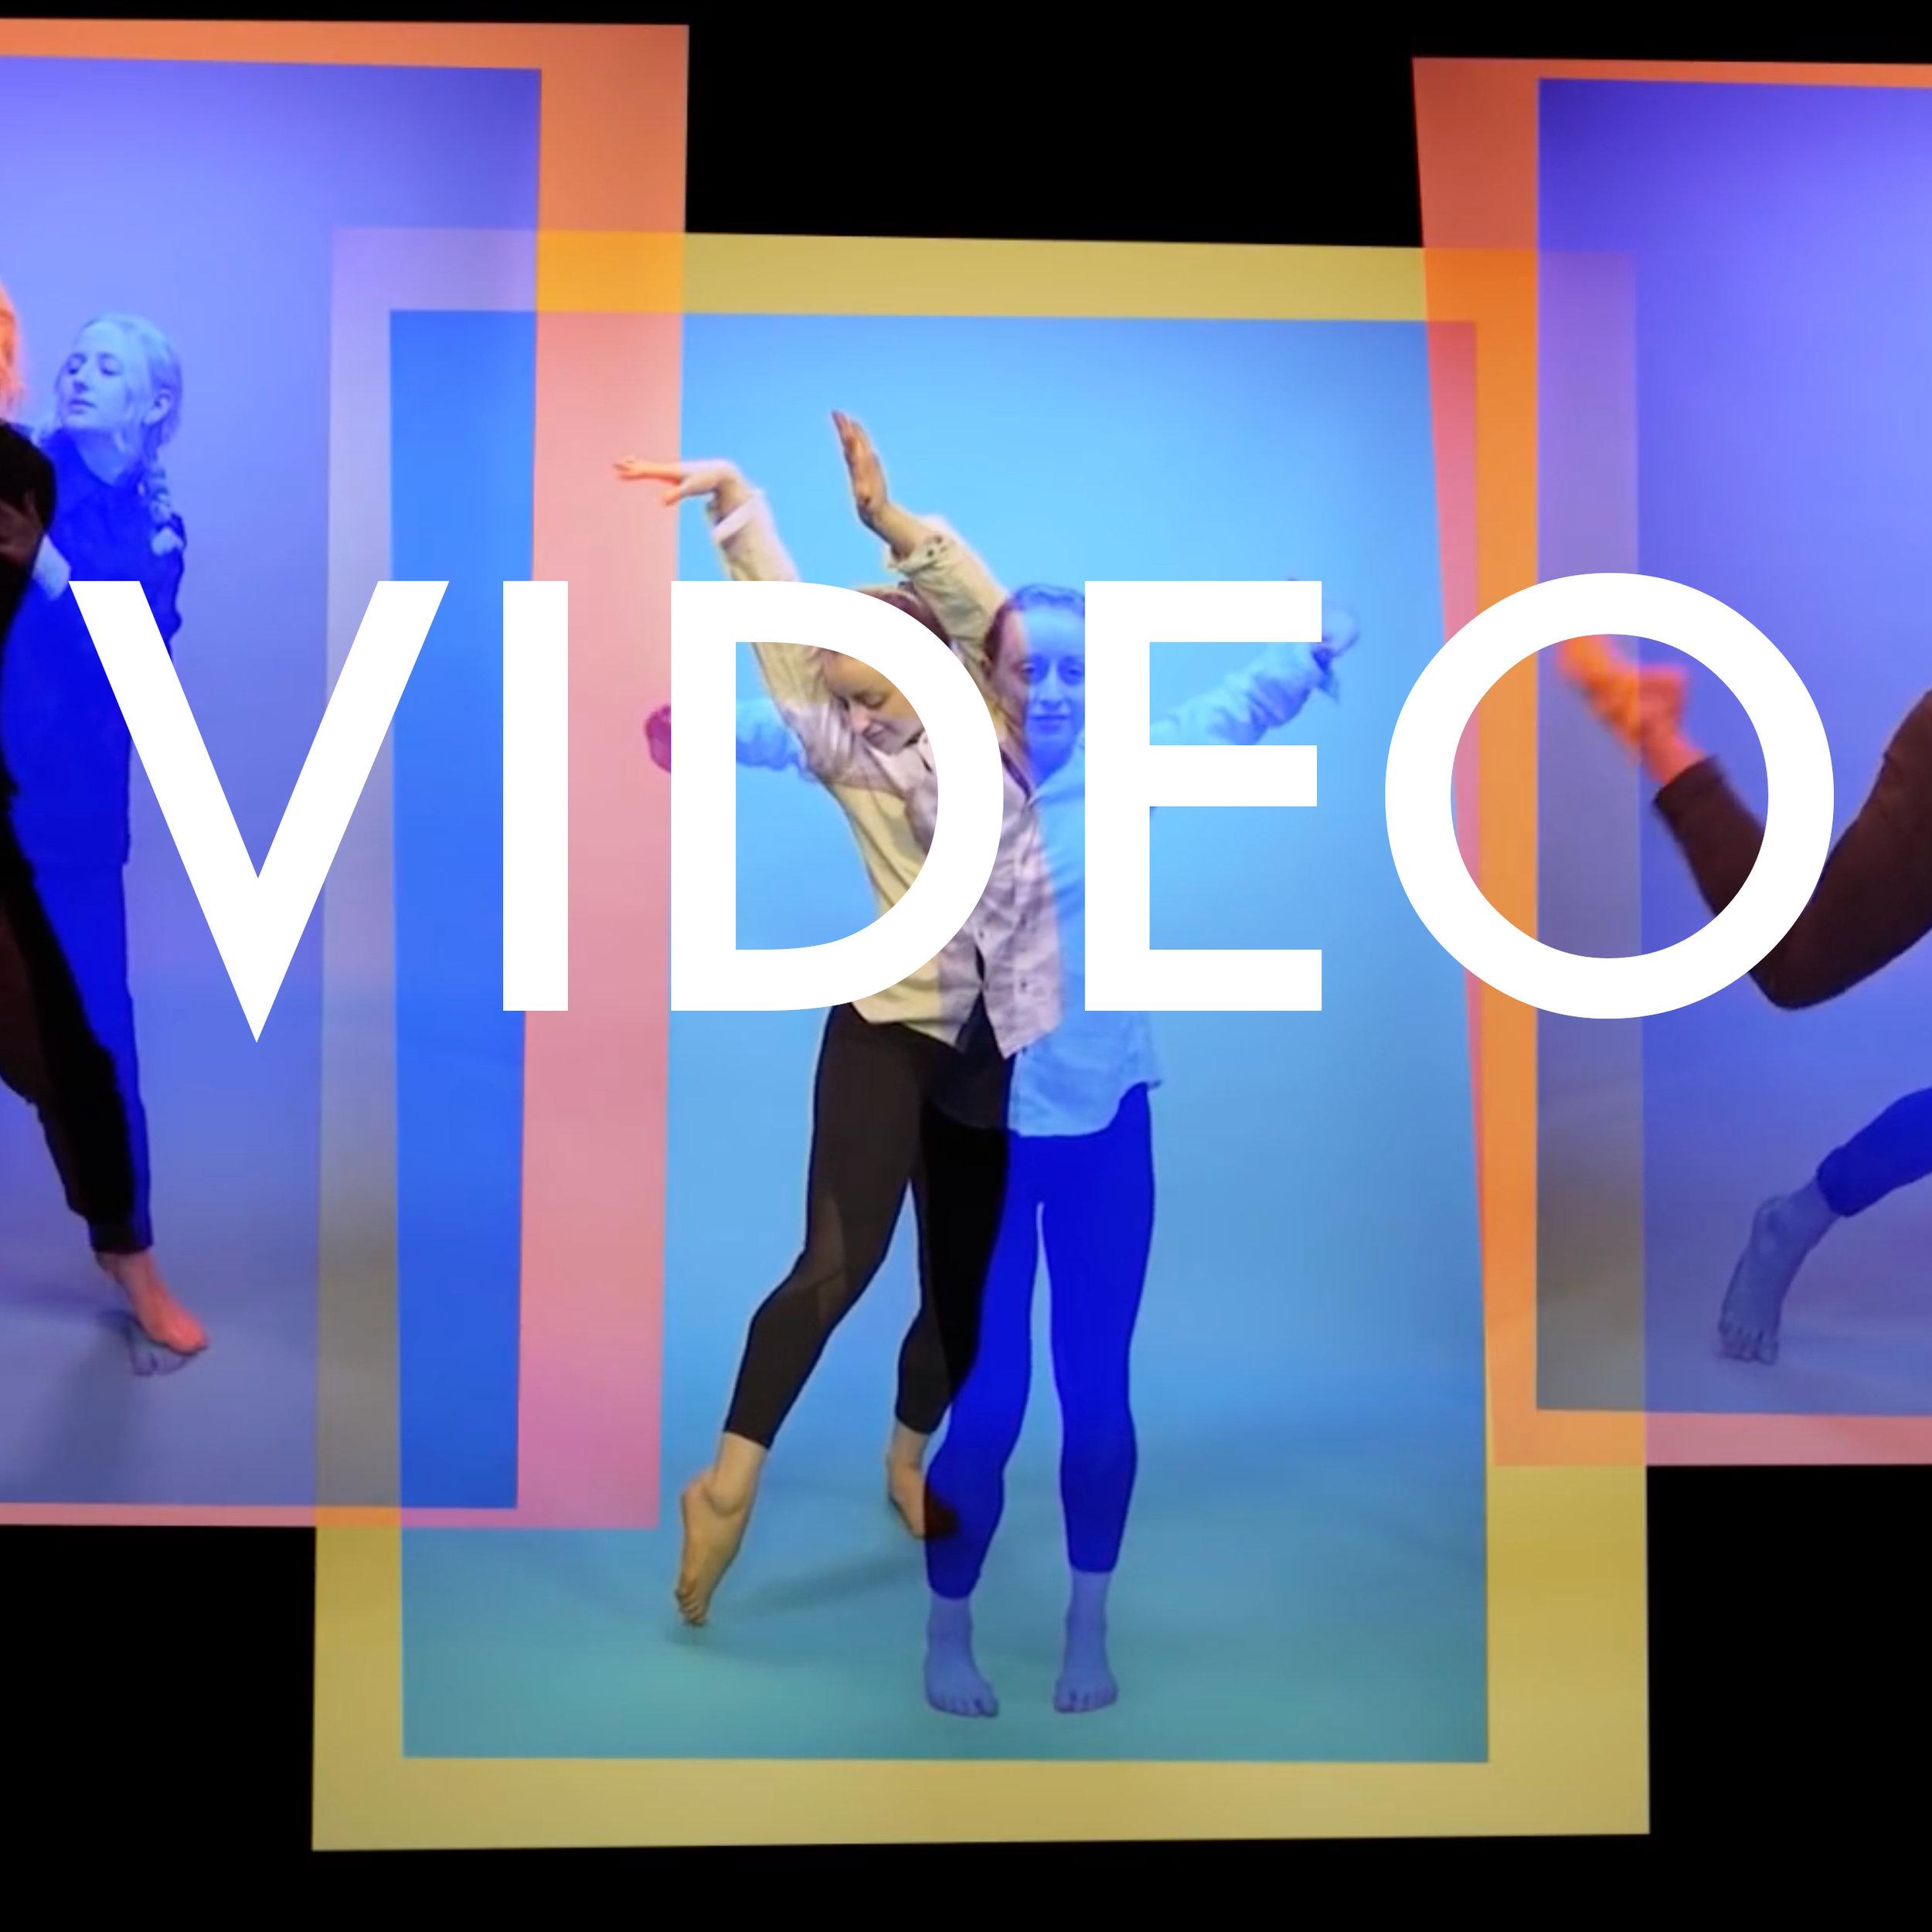 videopic .jpg